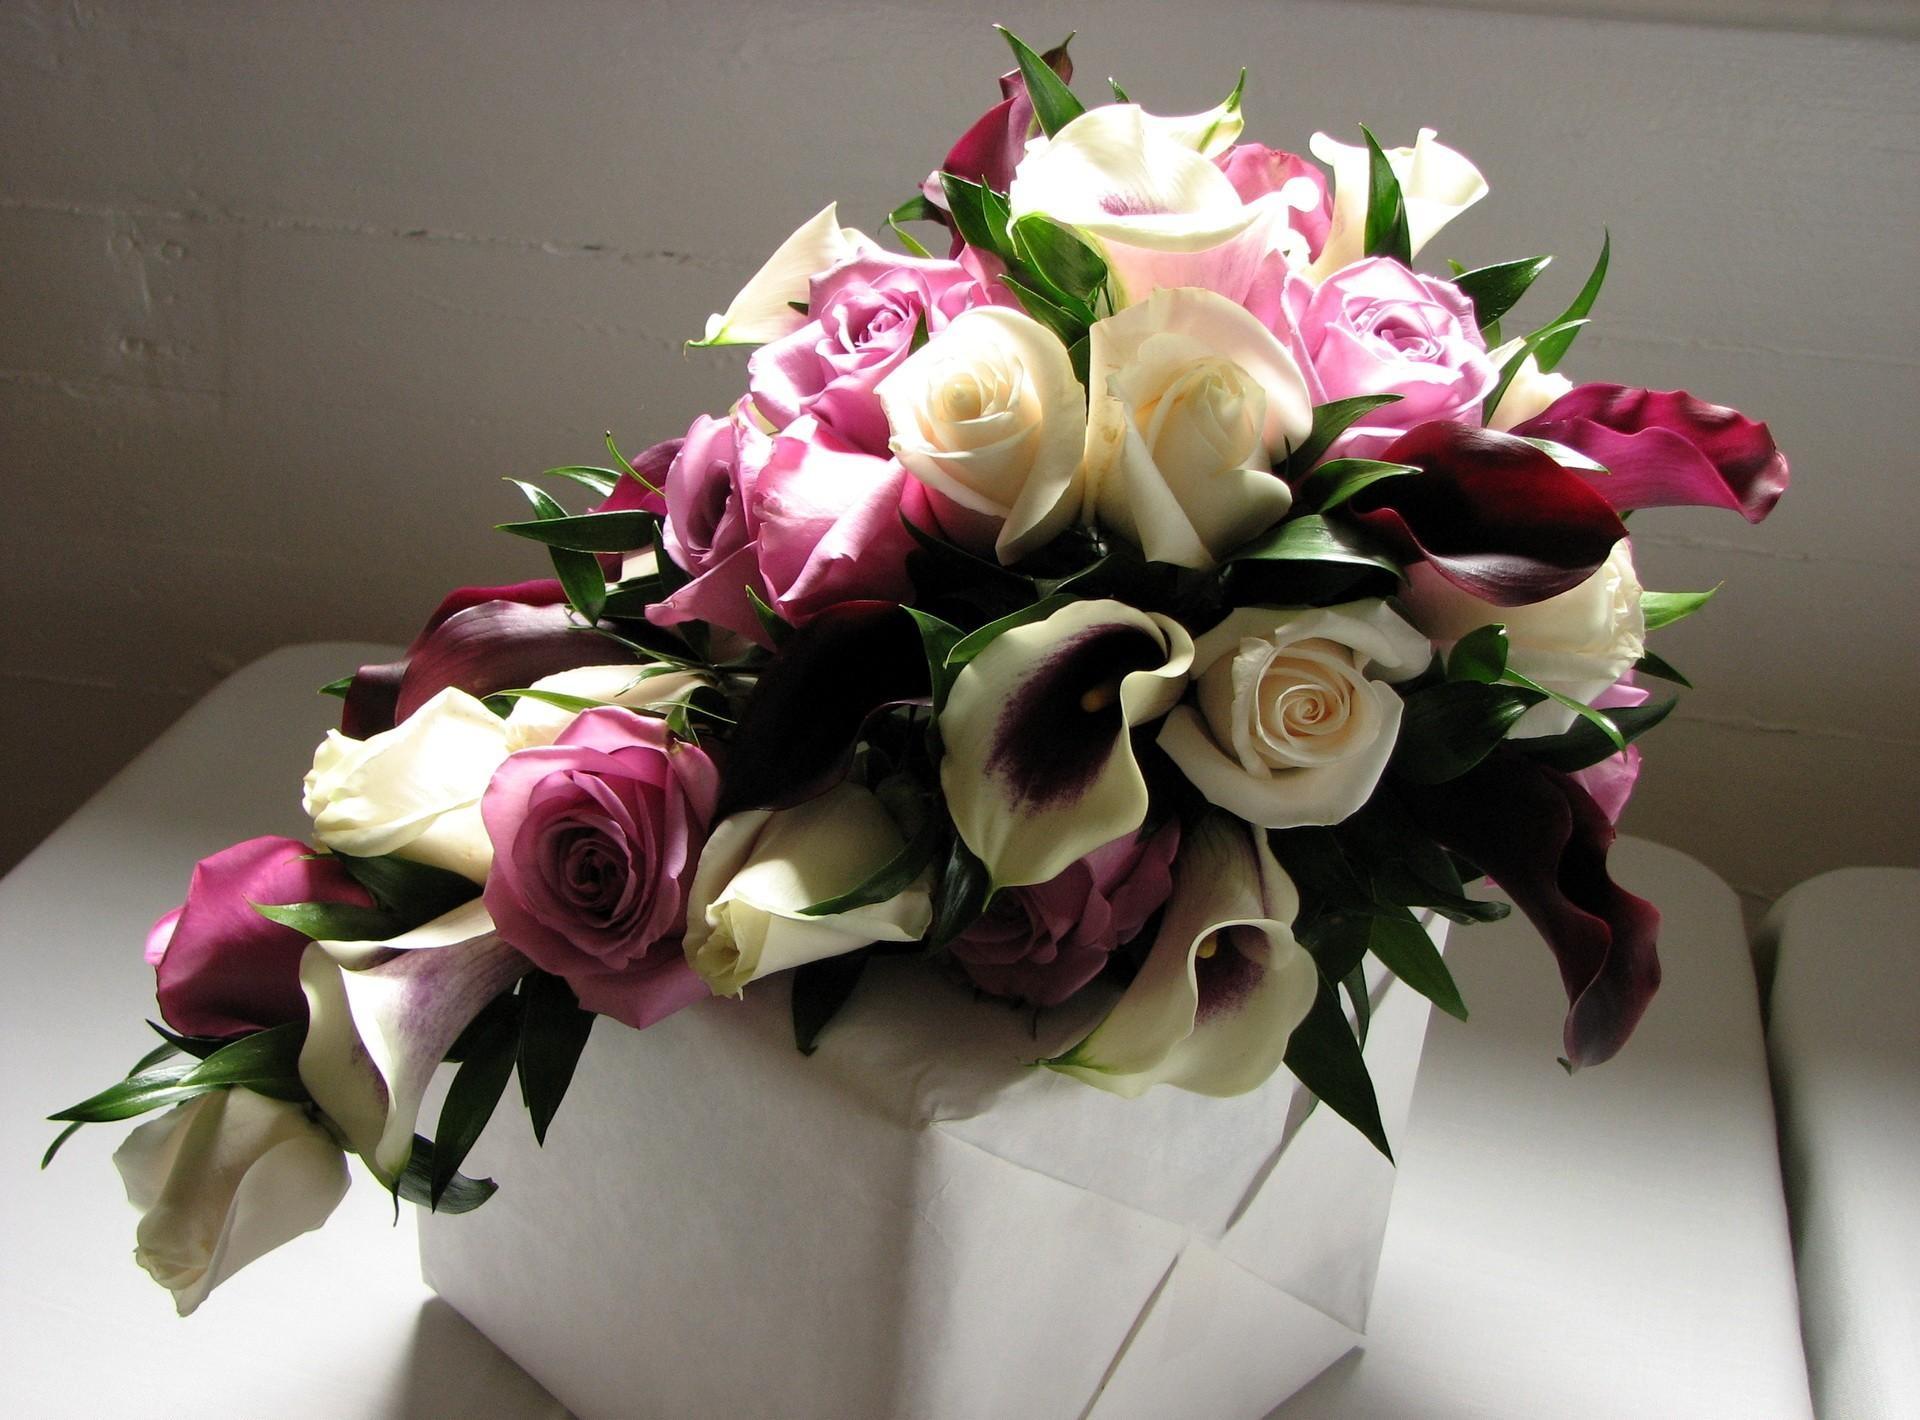 Fabelhaft Hintergrundbilder : Rosa, Calla lilien, KUNST, Blume, Flora &TJ_03